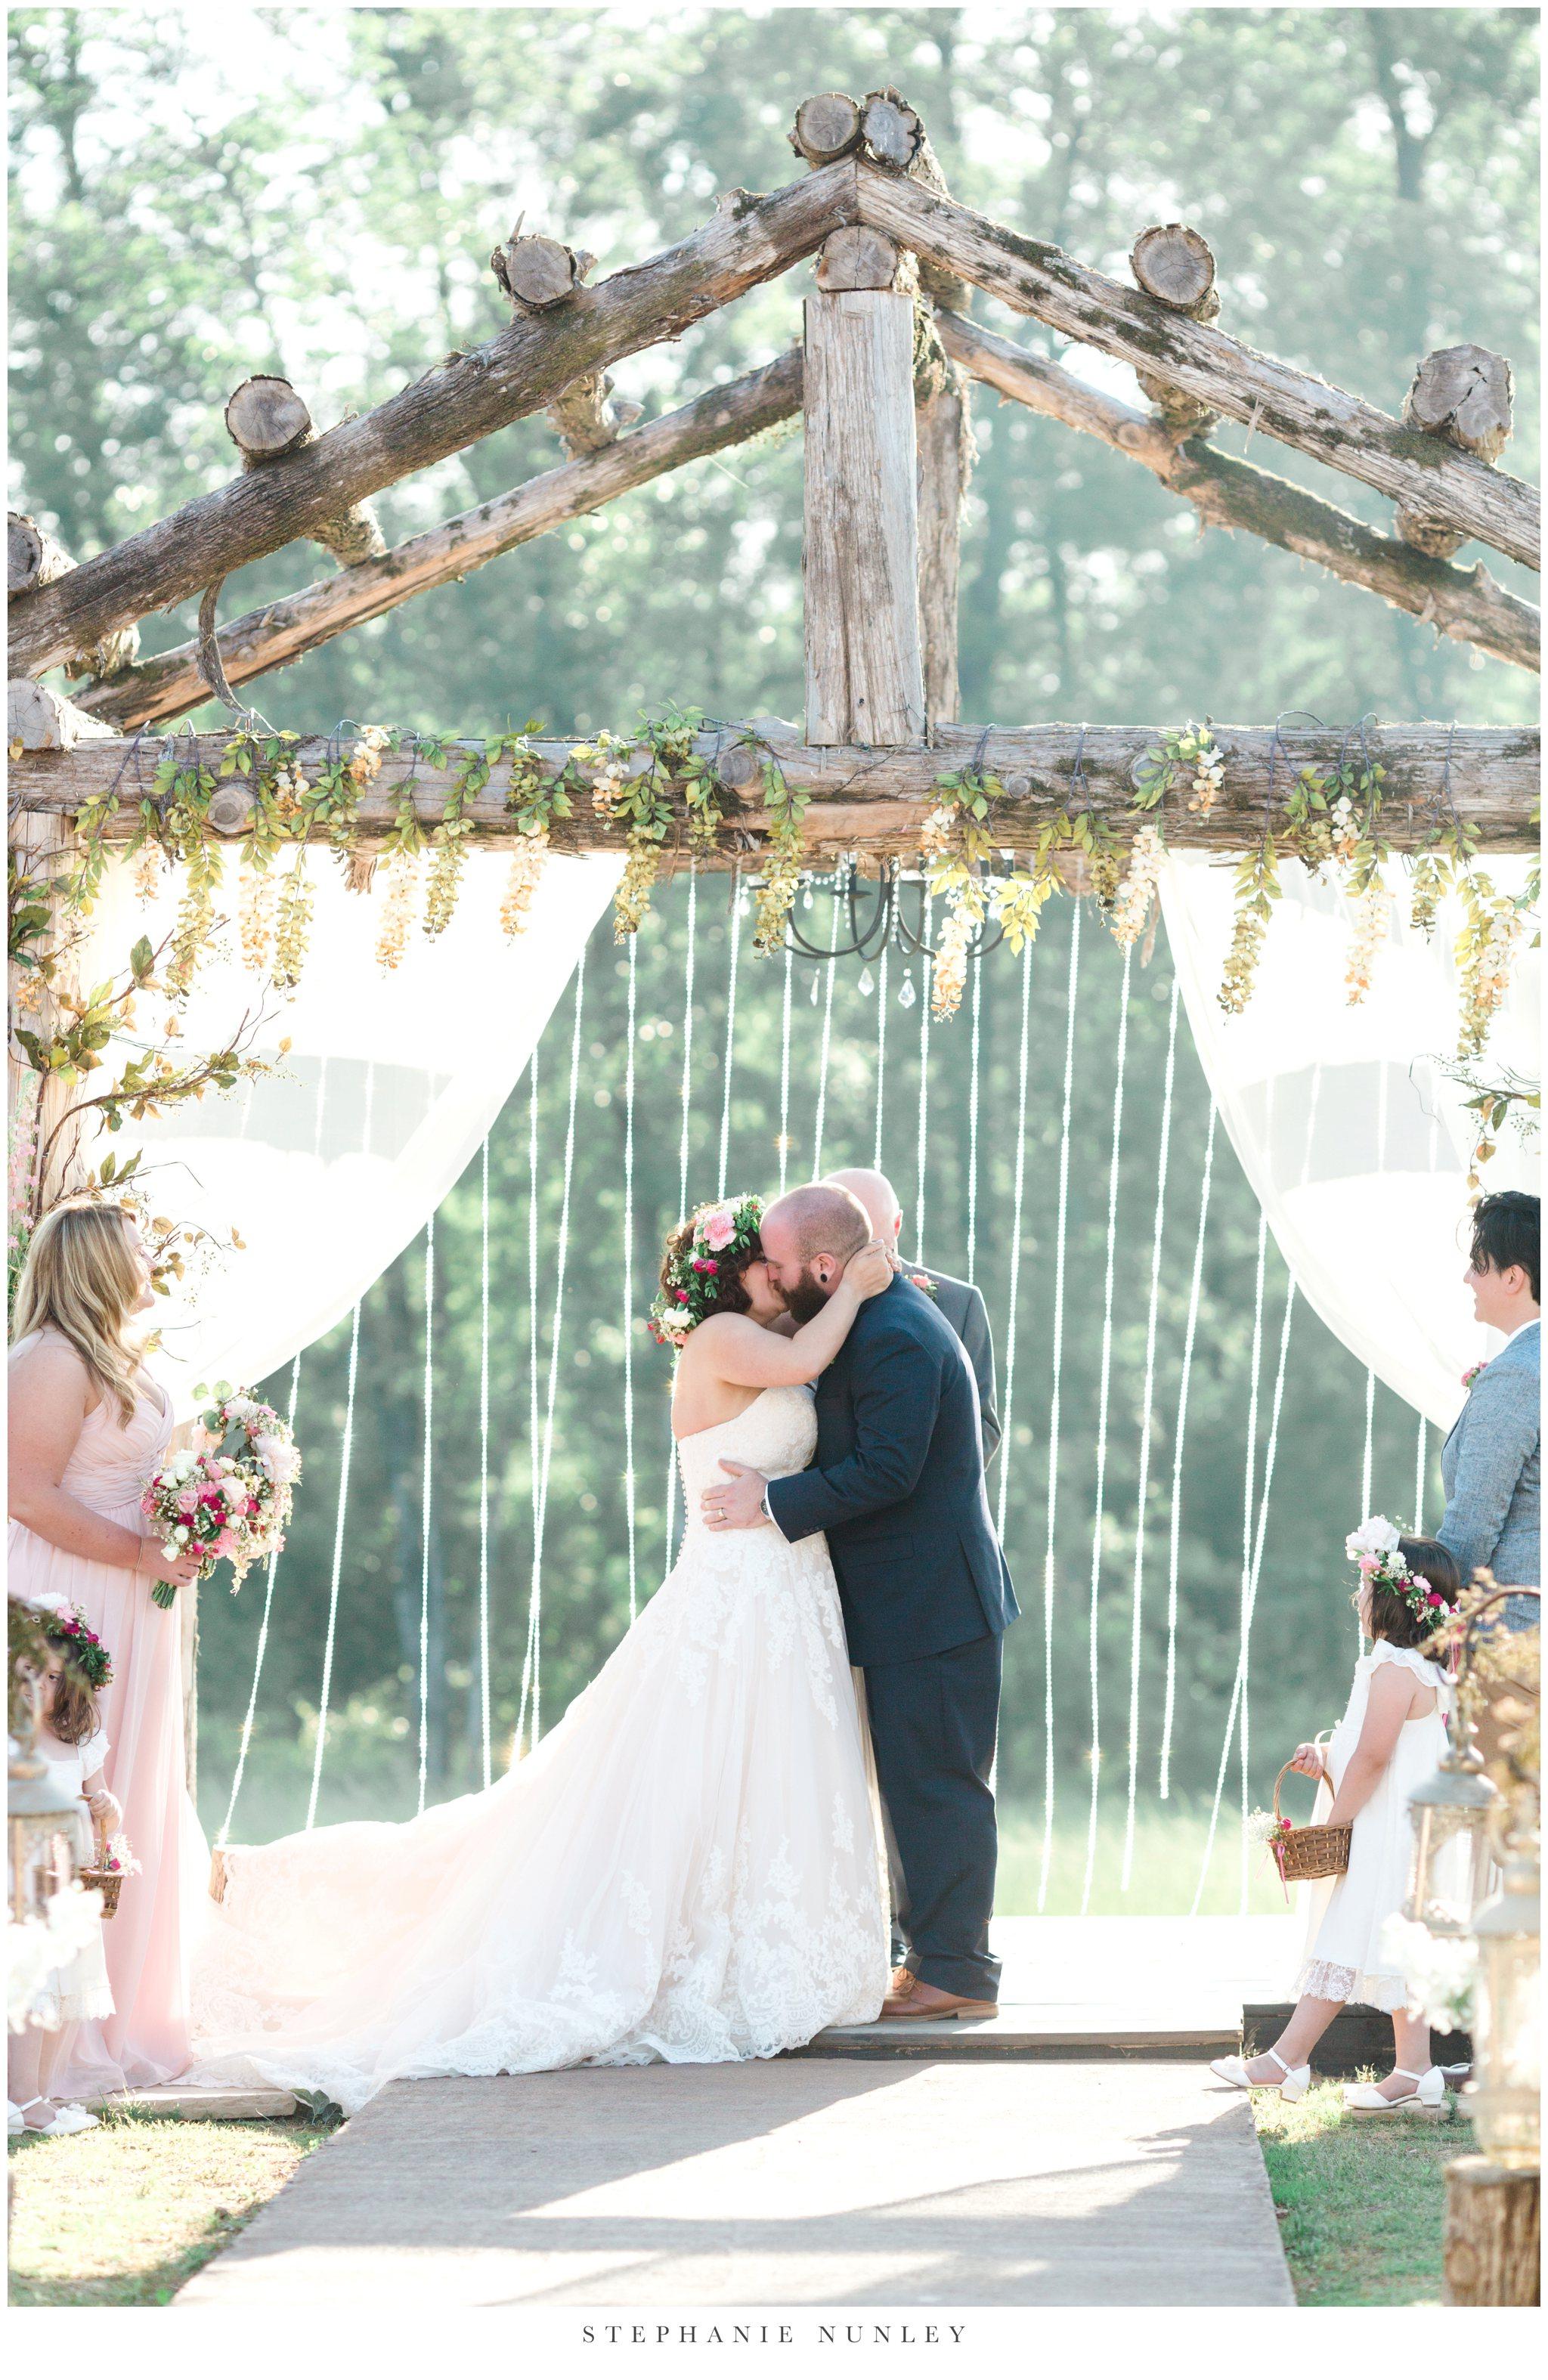 romantic-outdoor-wedding-with-flower-crown-0103.jpg